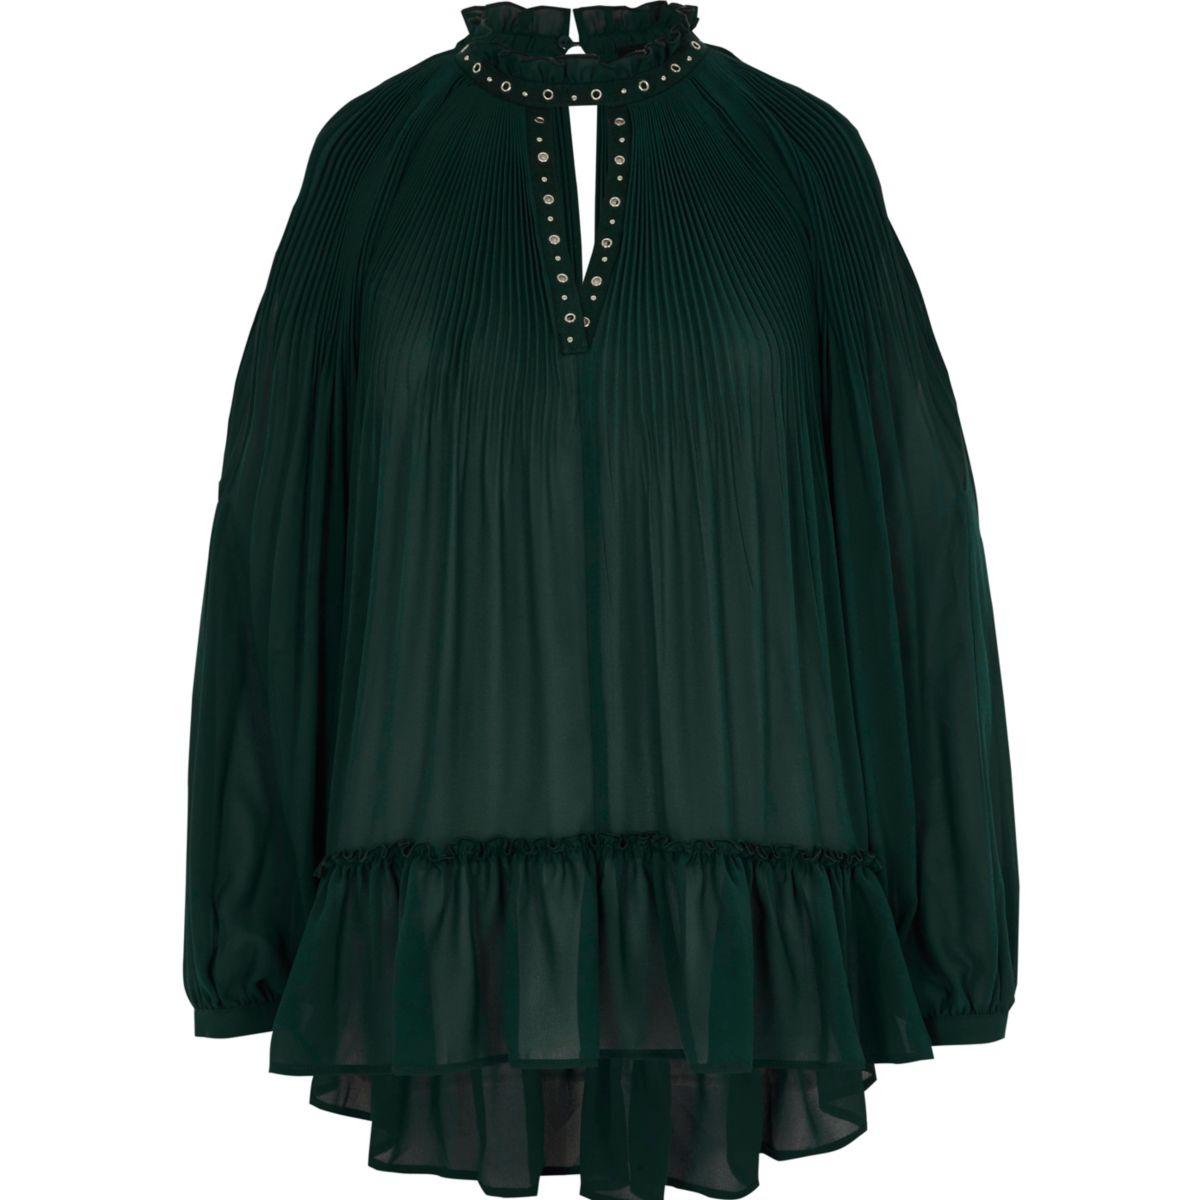 Green chiffon pleated eyelet detail blouse